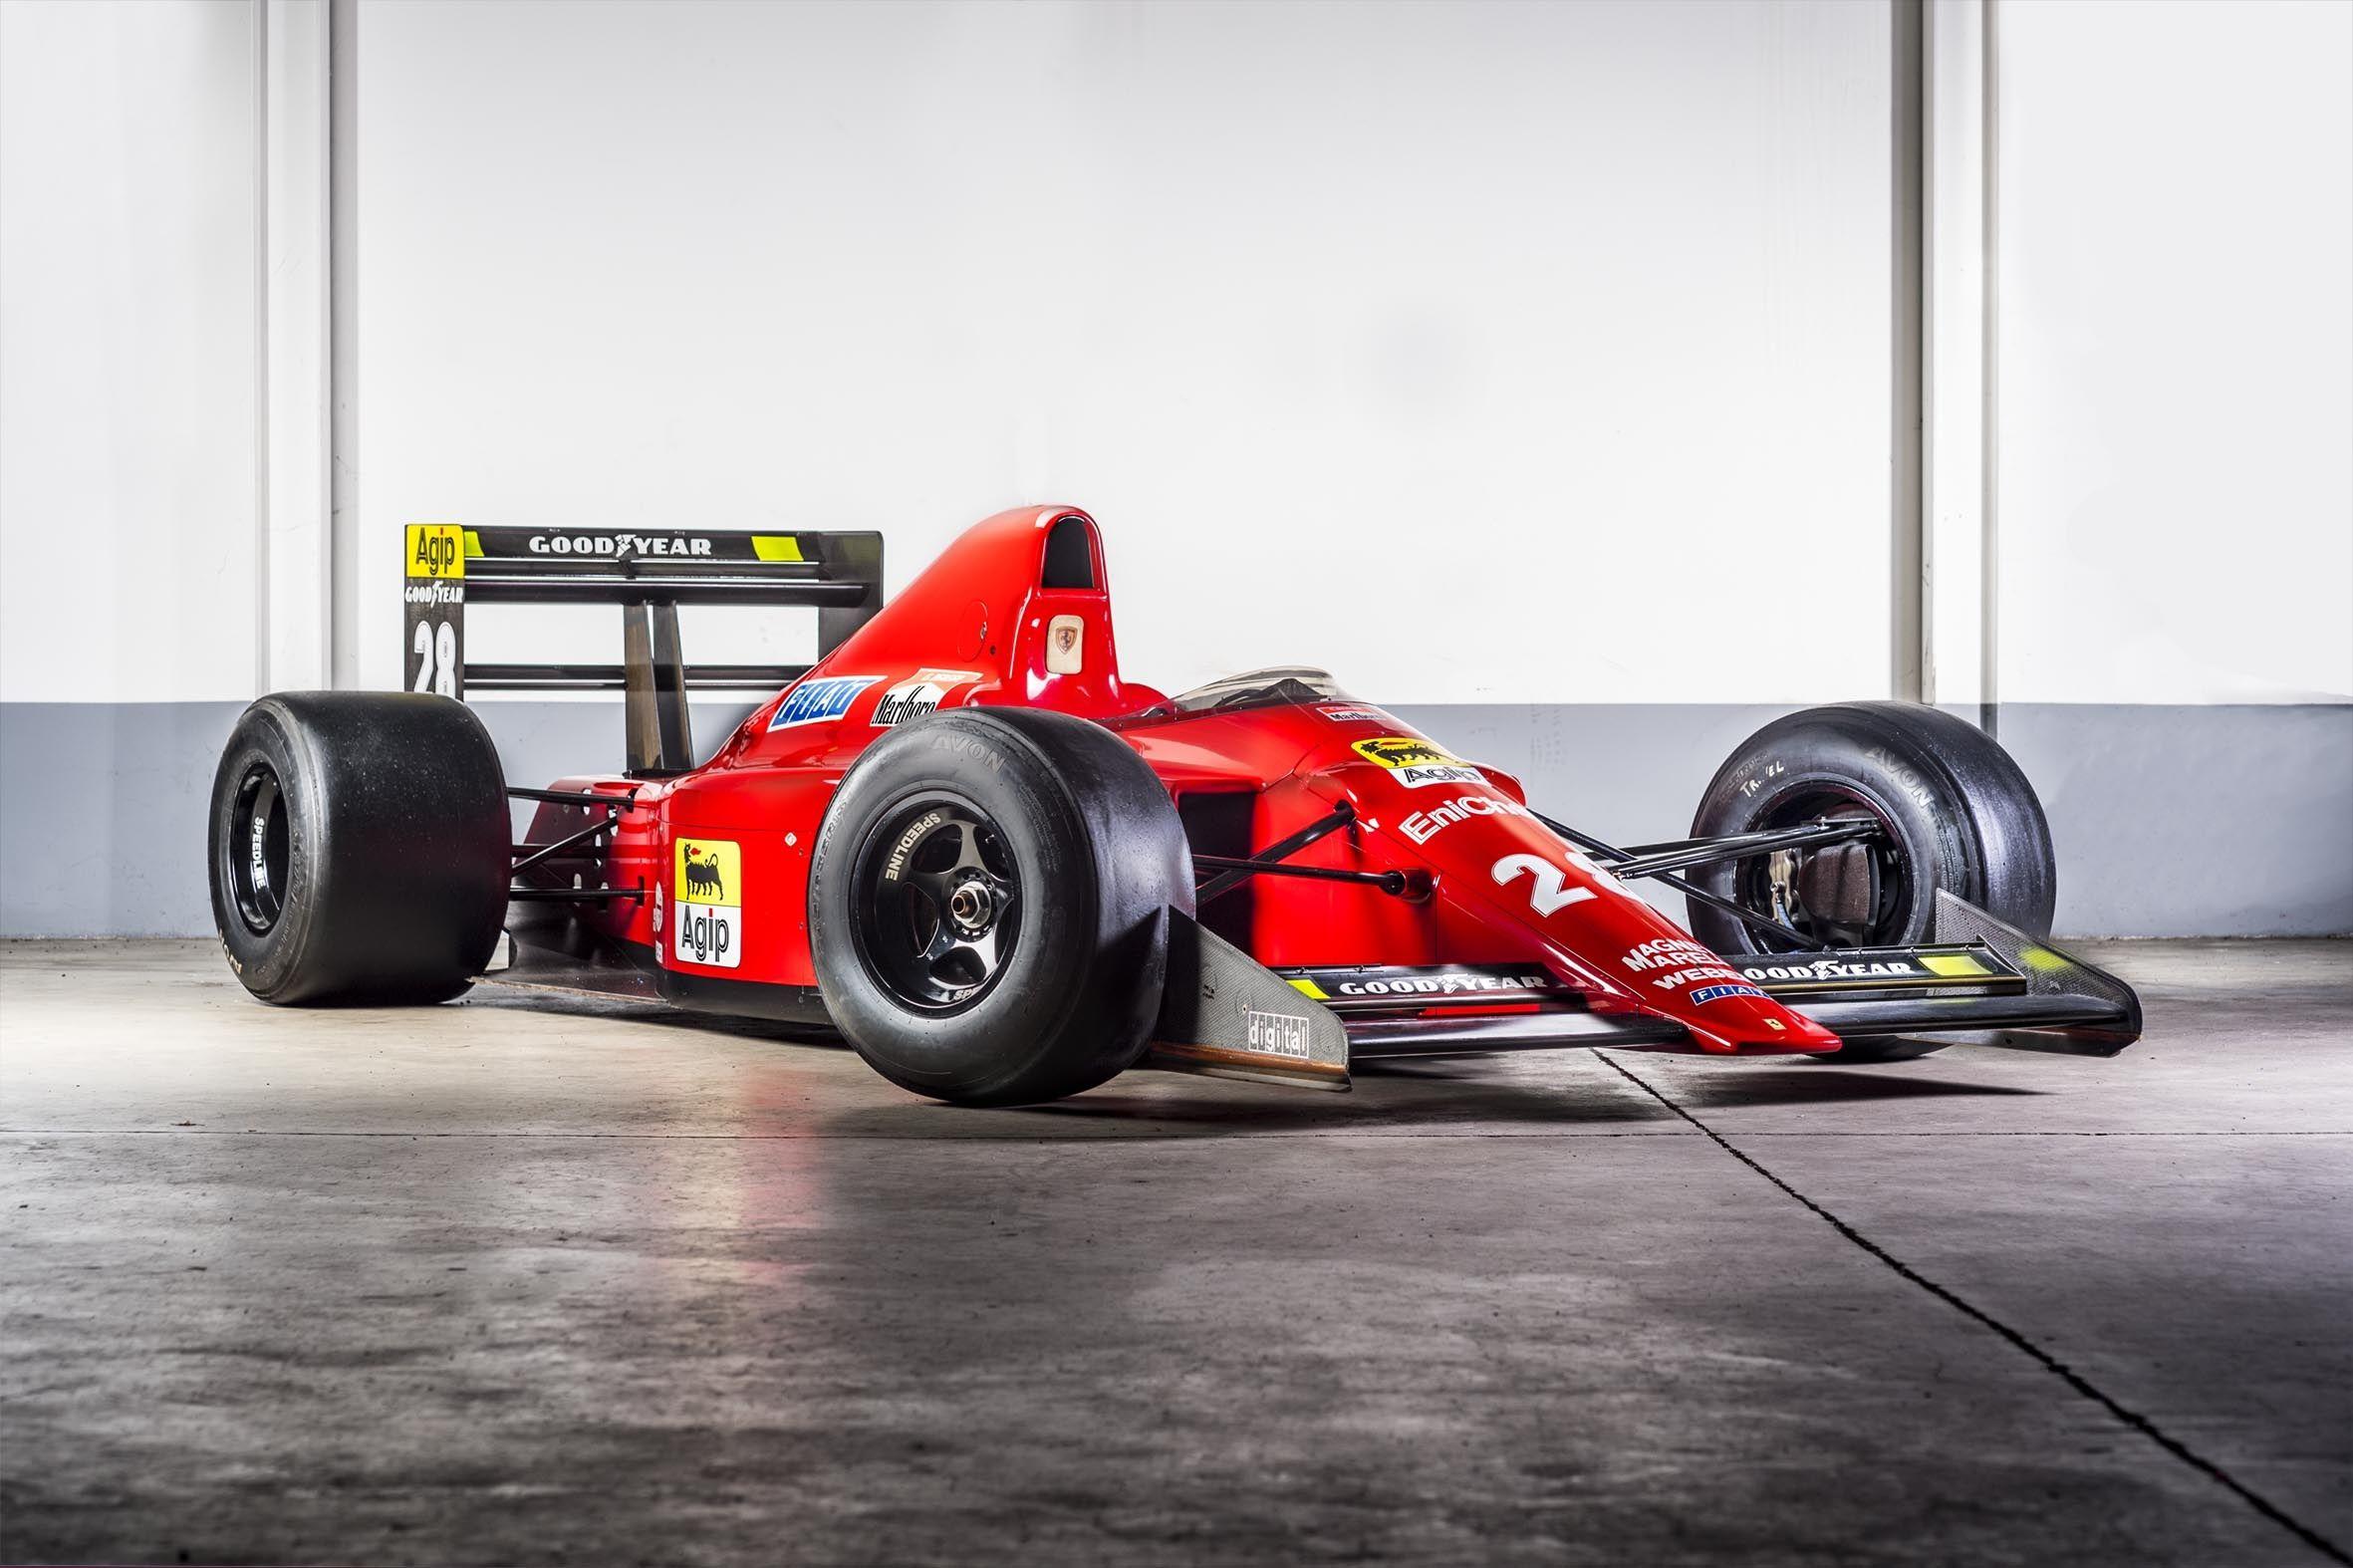 1989 Ferrari Formula 1 640 F1 Ex Berger Rebuilt At Ferrari F1 Clienti Ferrari F1 Formel 1 Ferrari